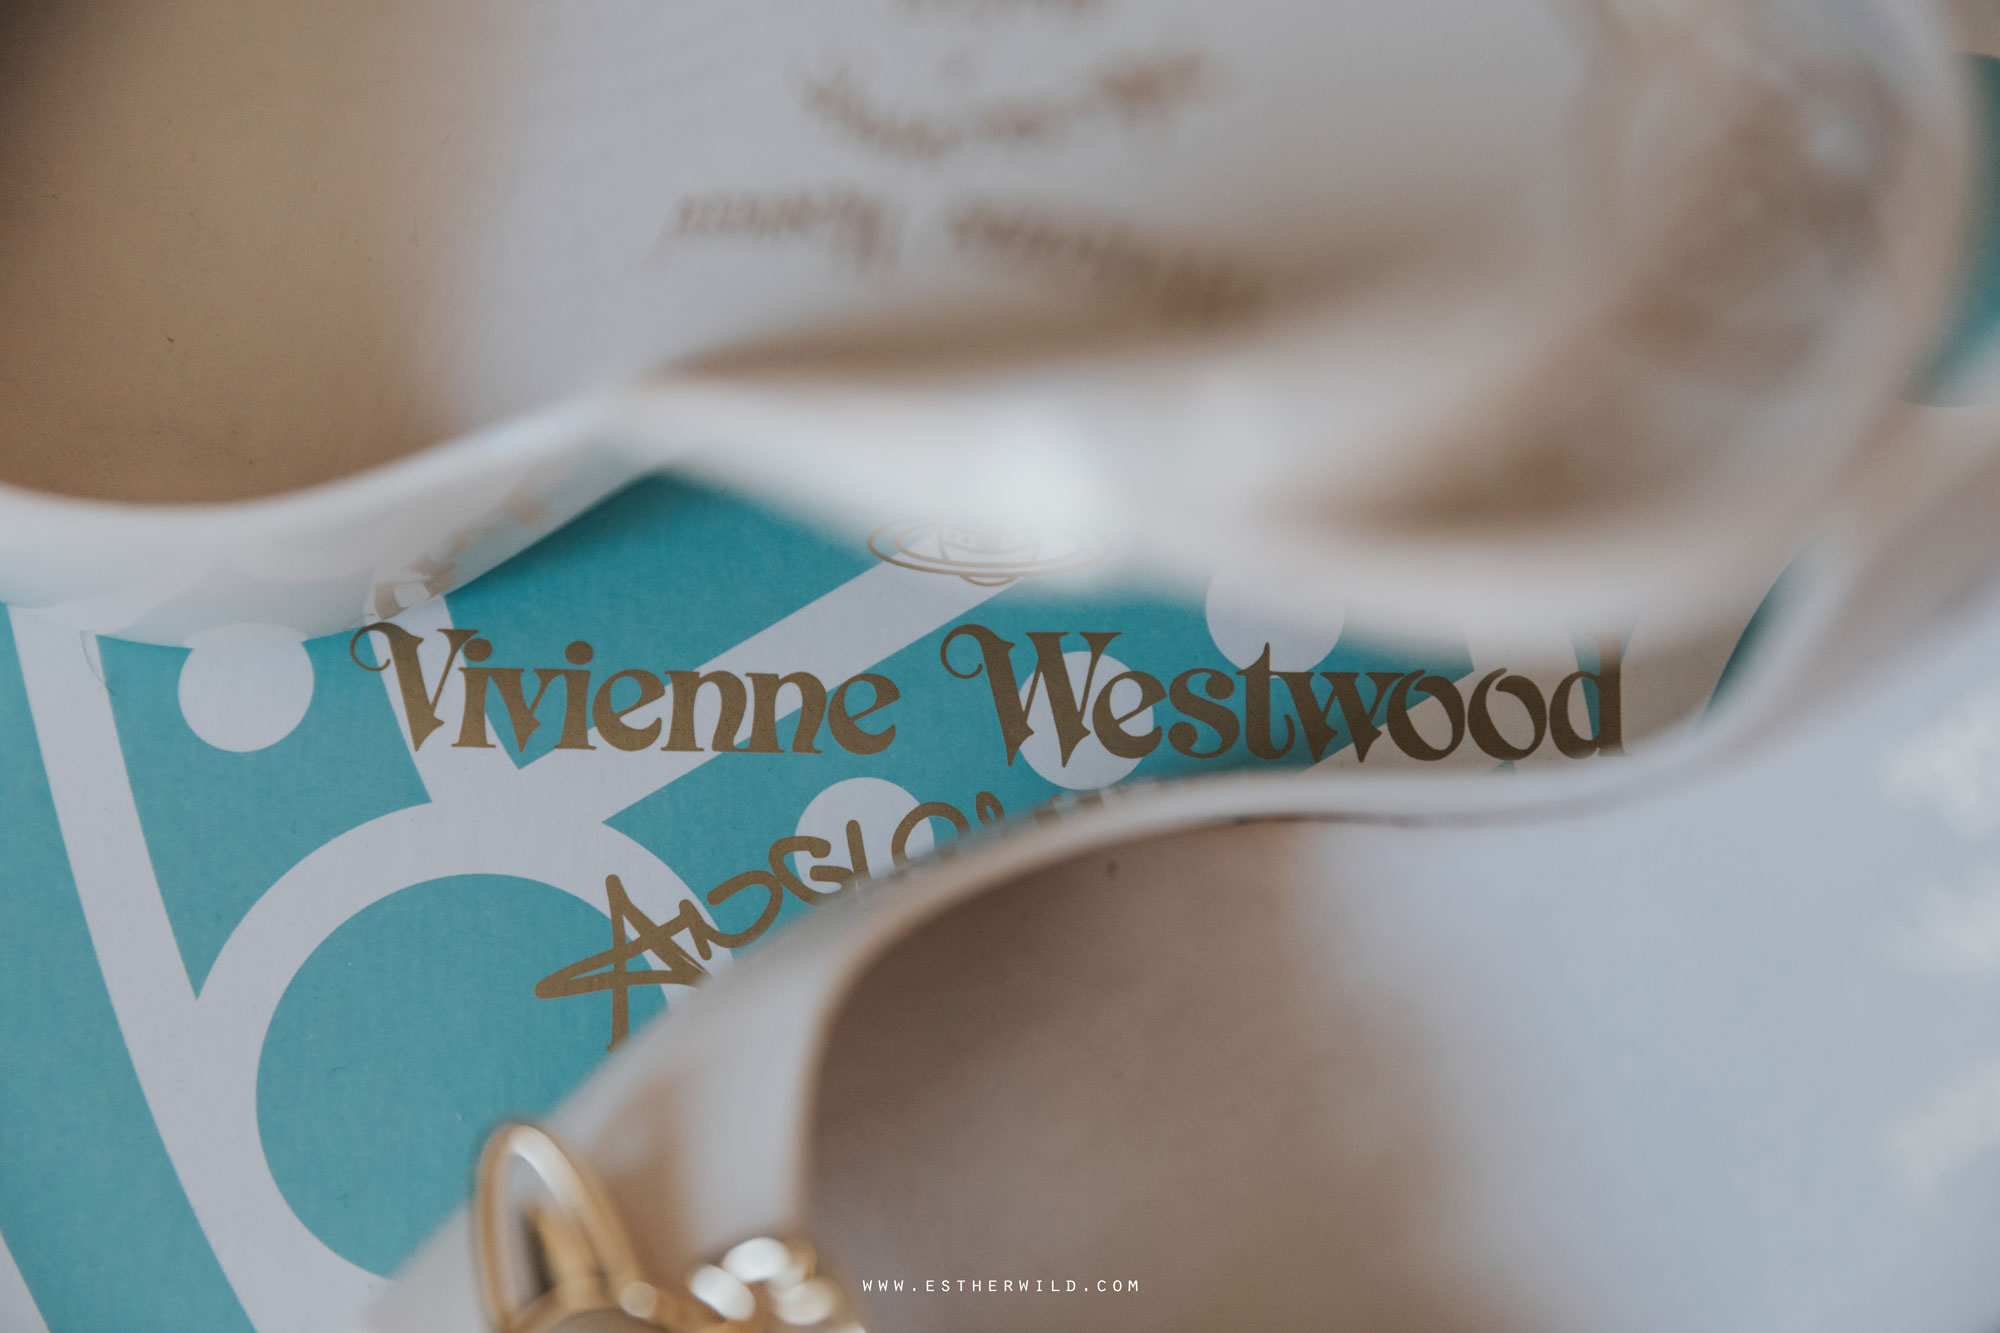 Cromer_Wedding_Beach_Outdoor_Ceremony_Norfolk_North_Lodge_Registry_Office_Rocket_House_Cafe_Cromer_Pier_IMG_3048.jpg